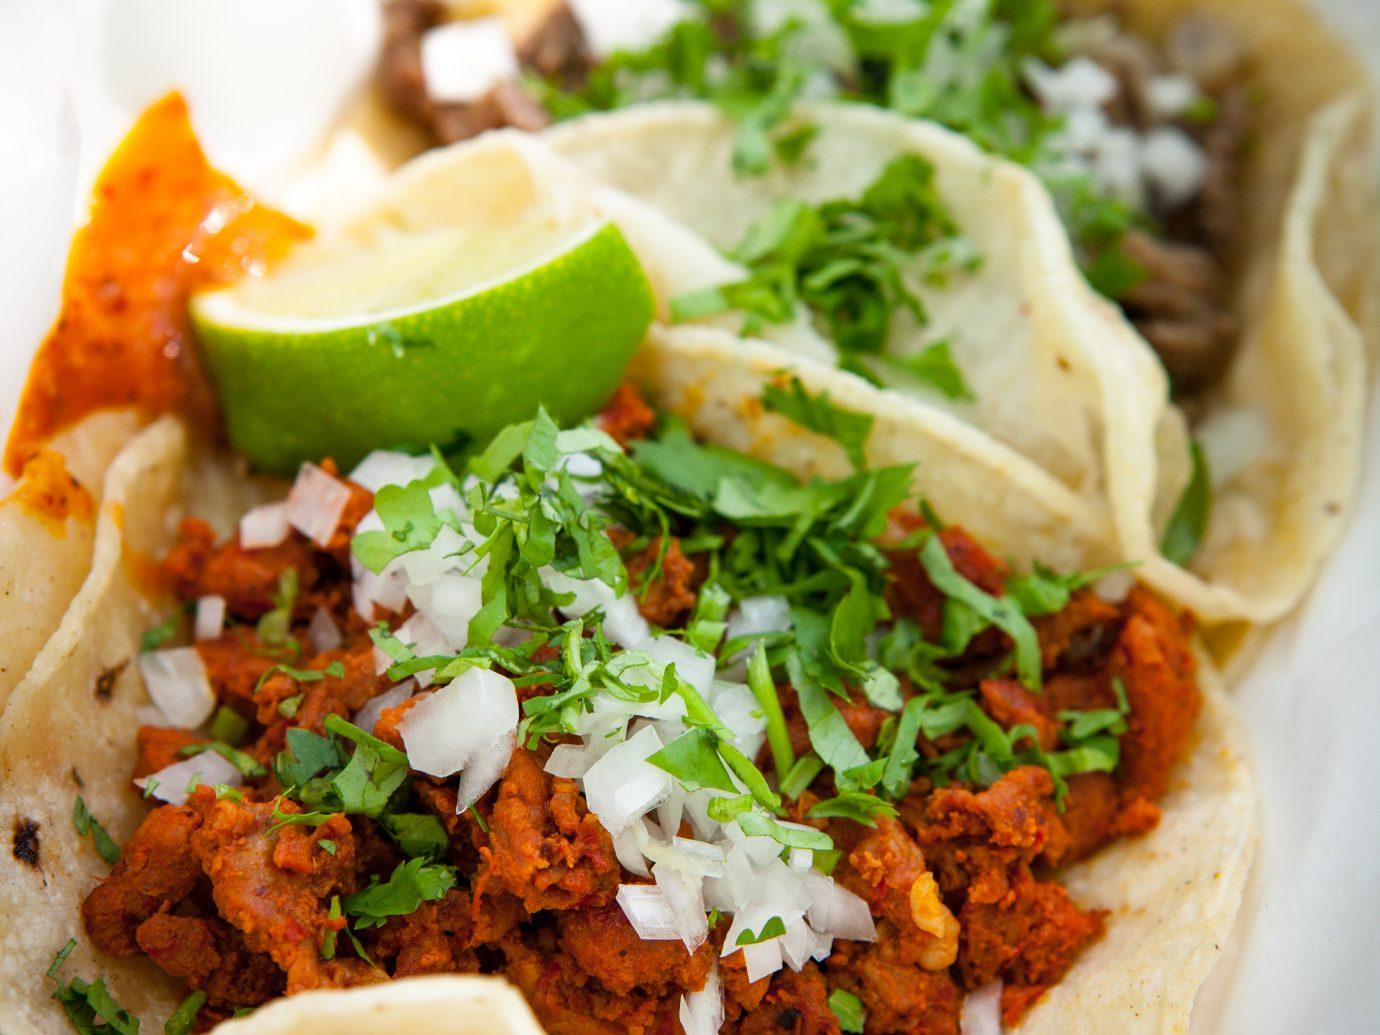 Beef and chorizo tacos